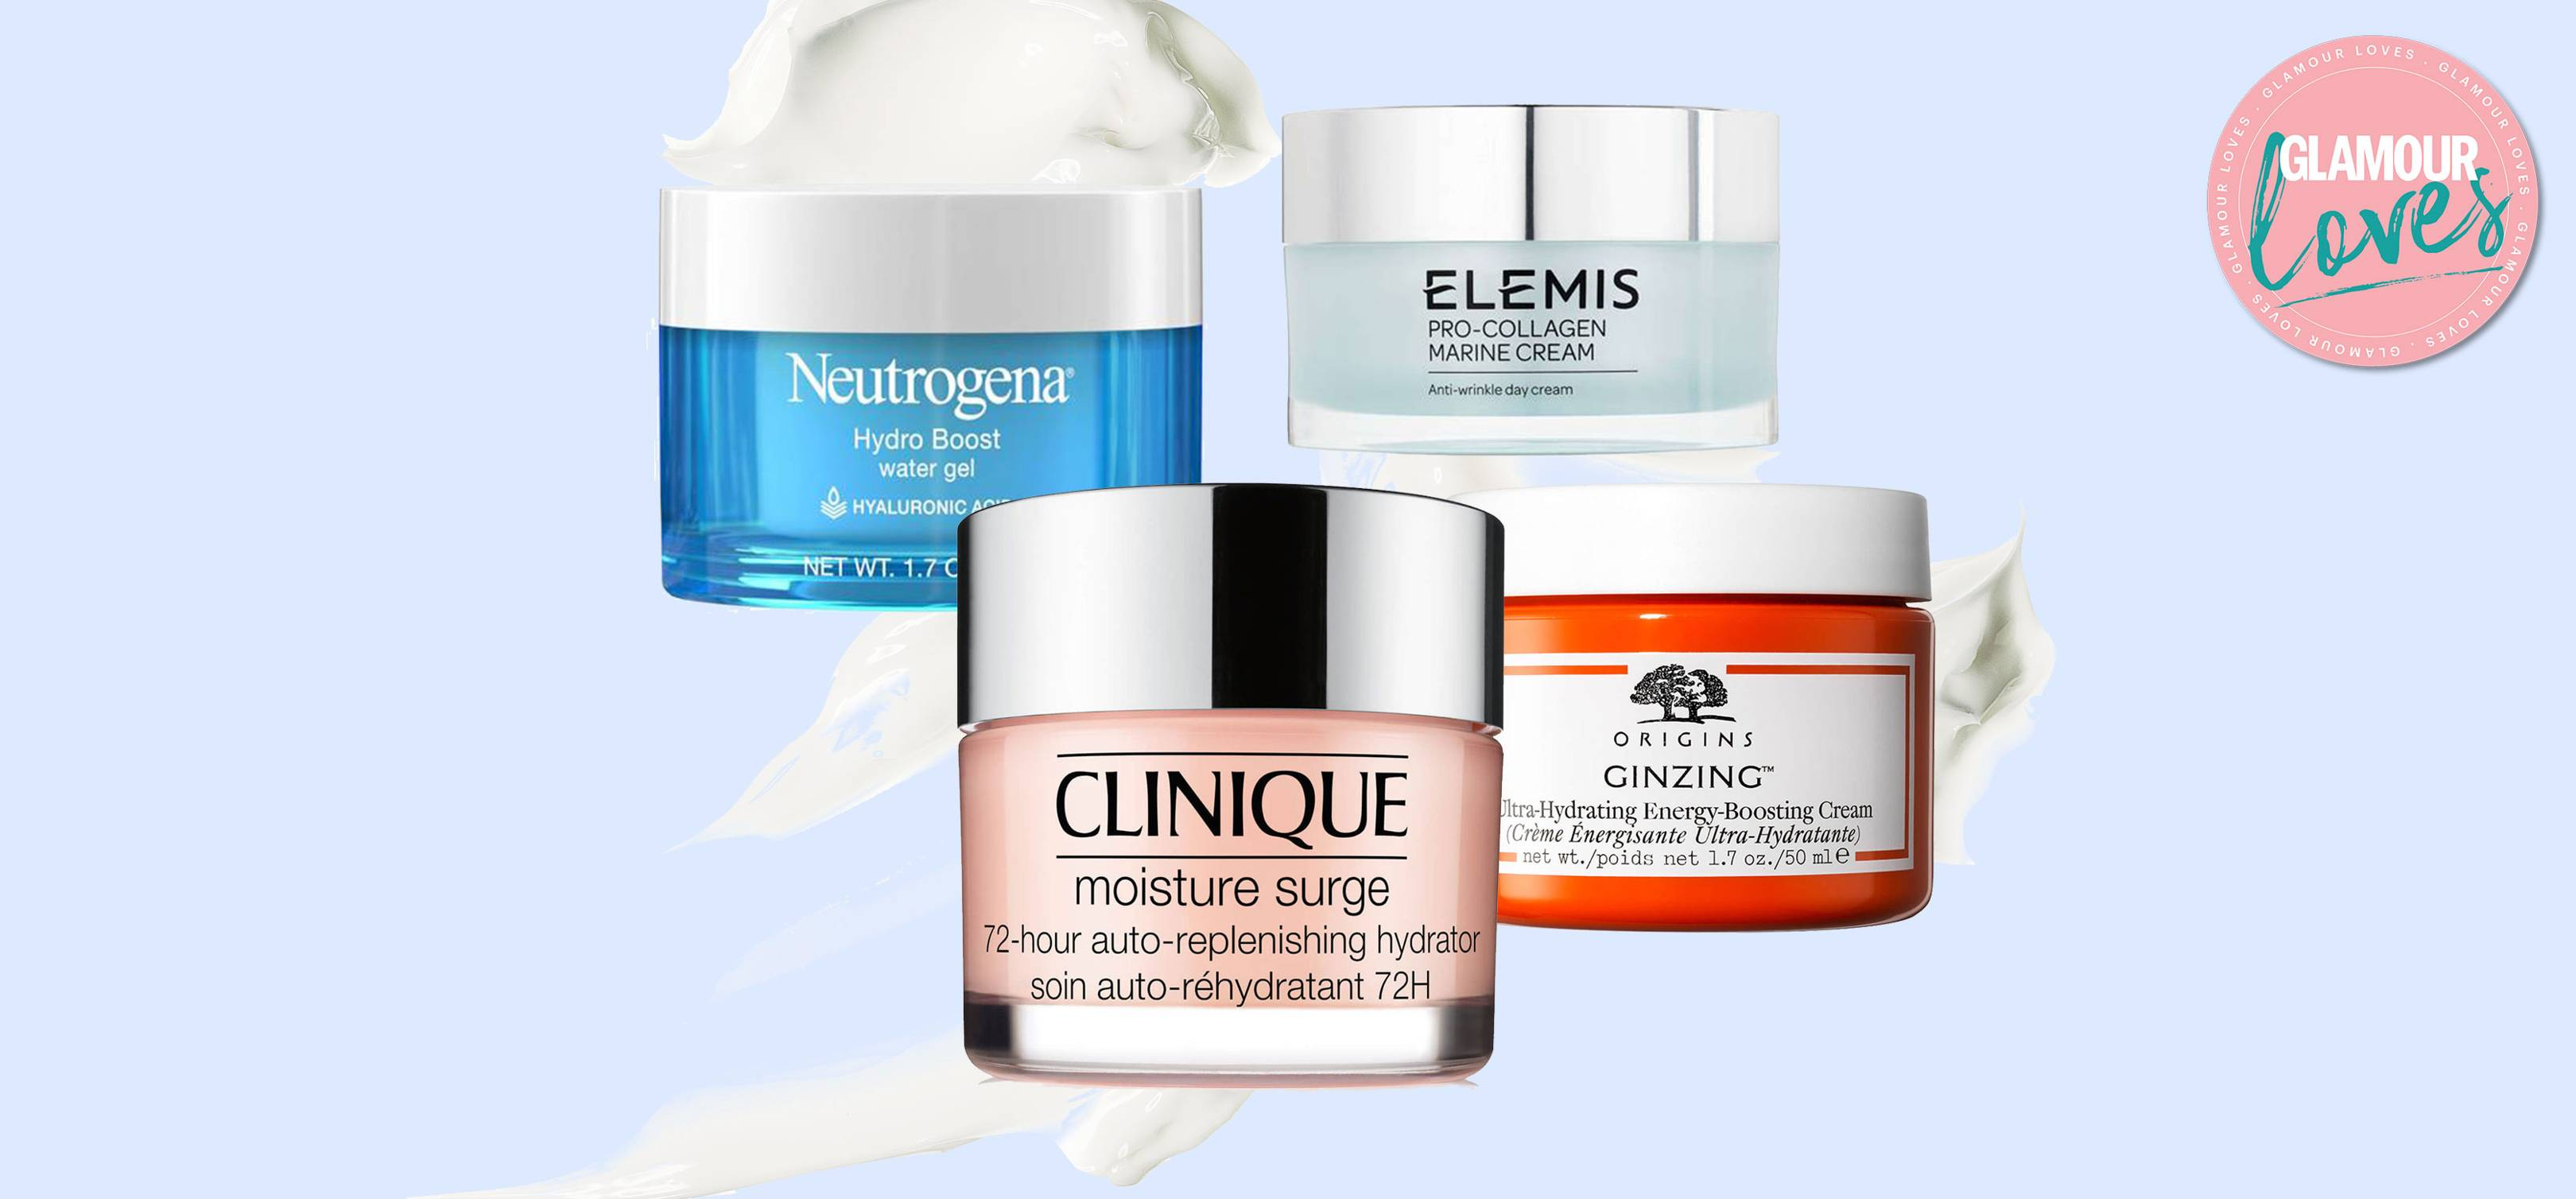 Best Moisturiser 23 Day Creams Night Creams For Your Skin Type Glamour Uk